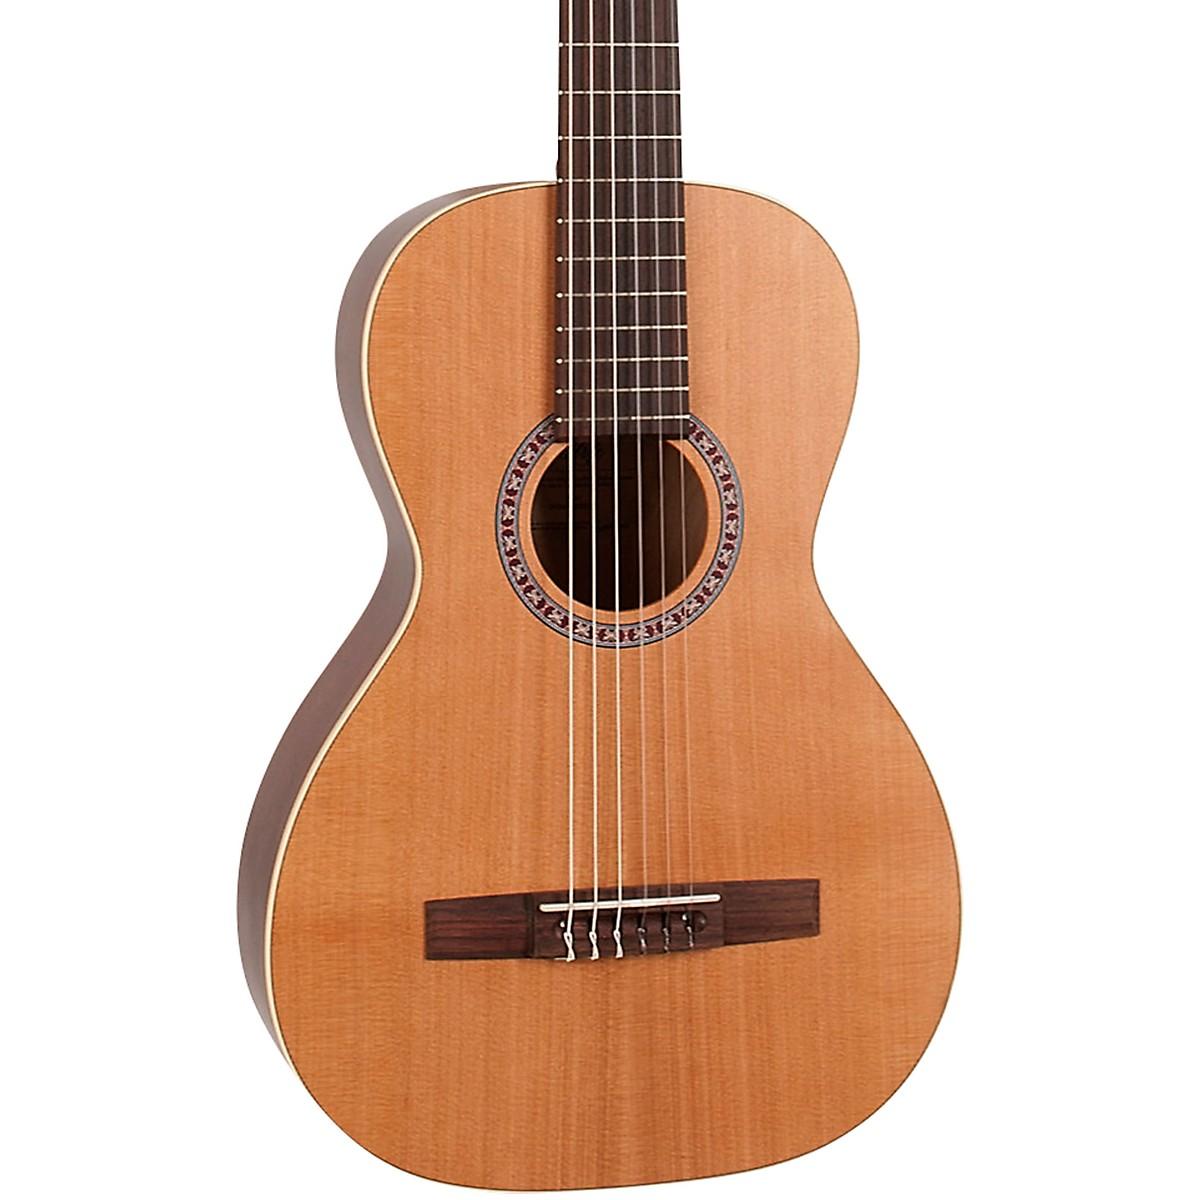 Godin Motif Nylon-String Guitar